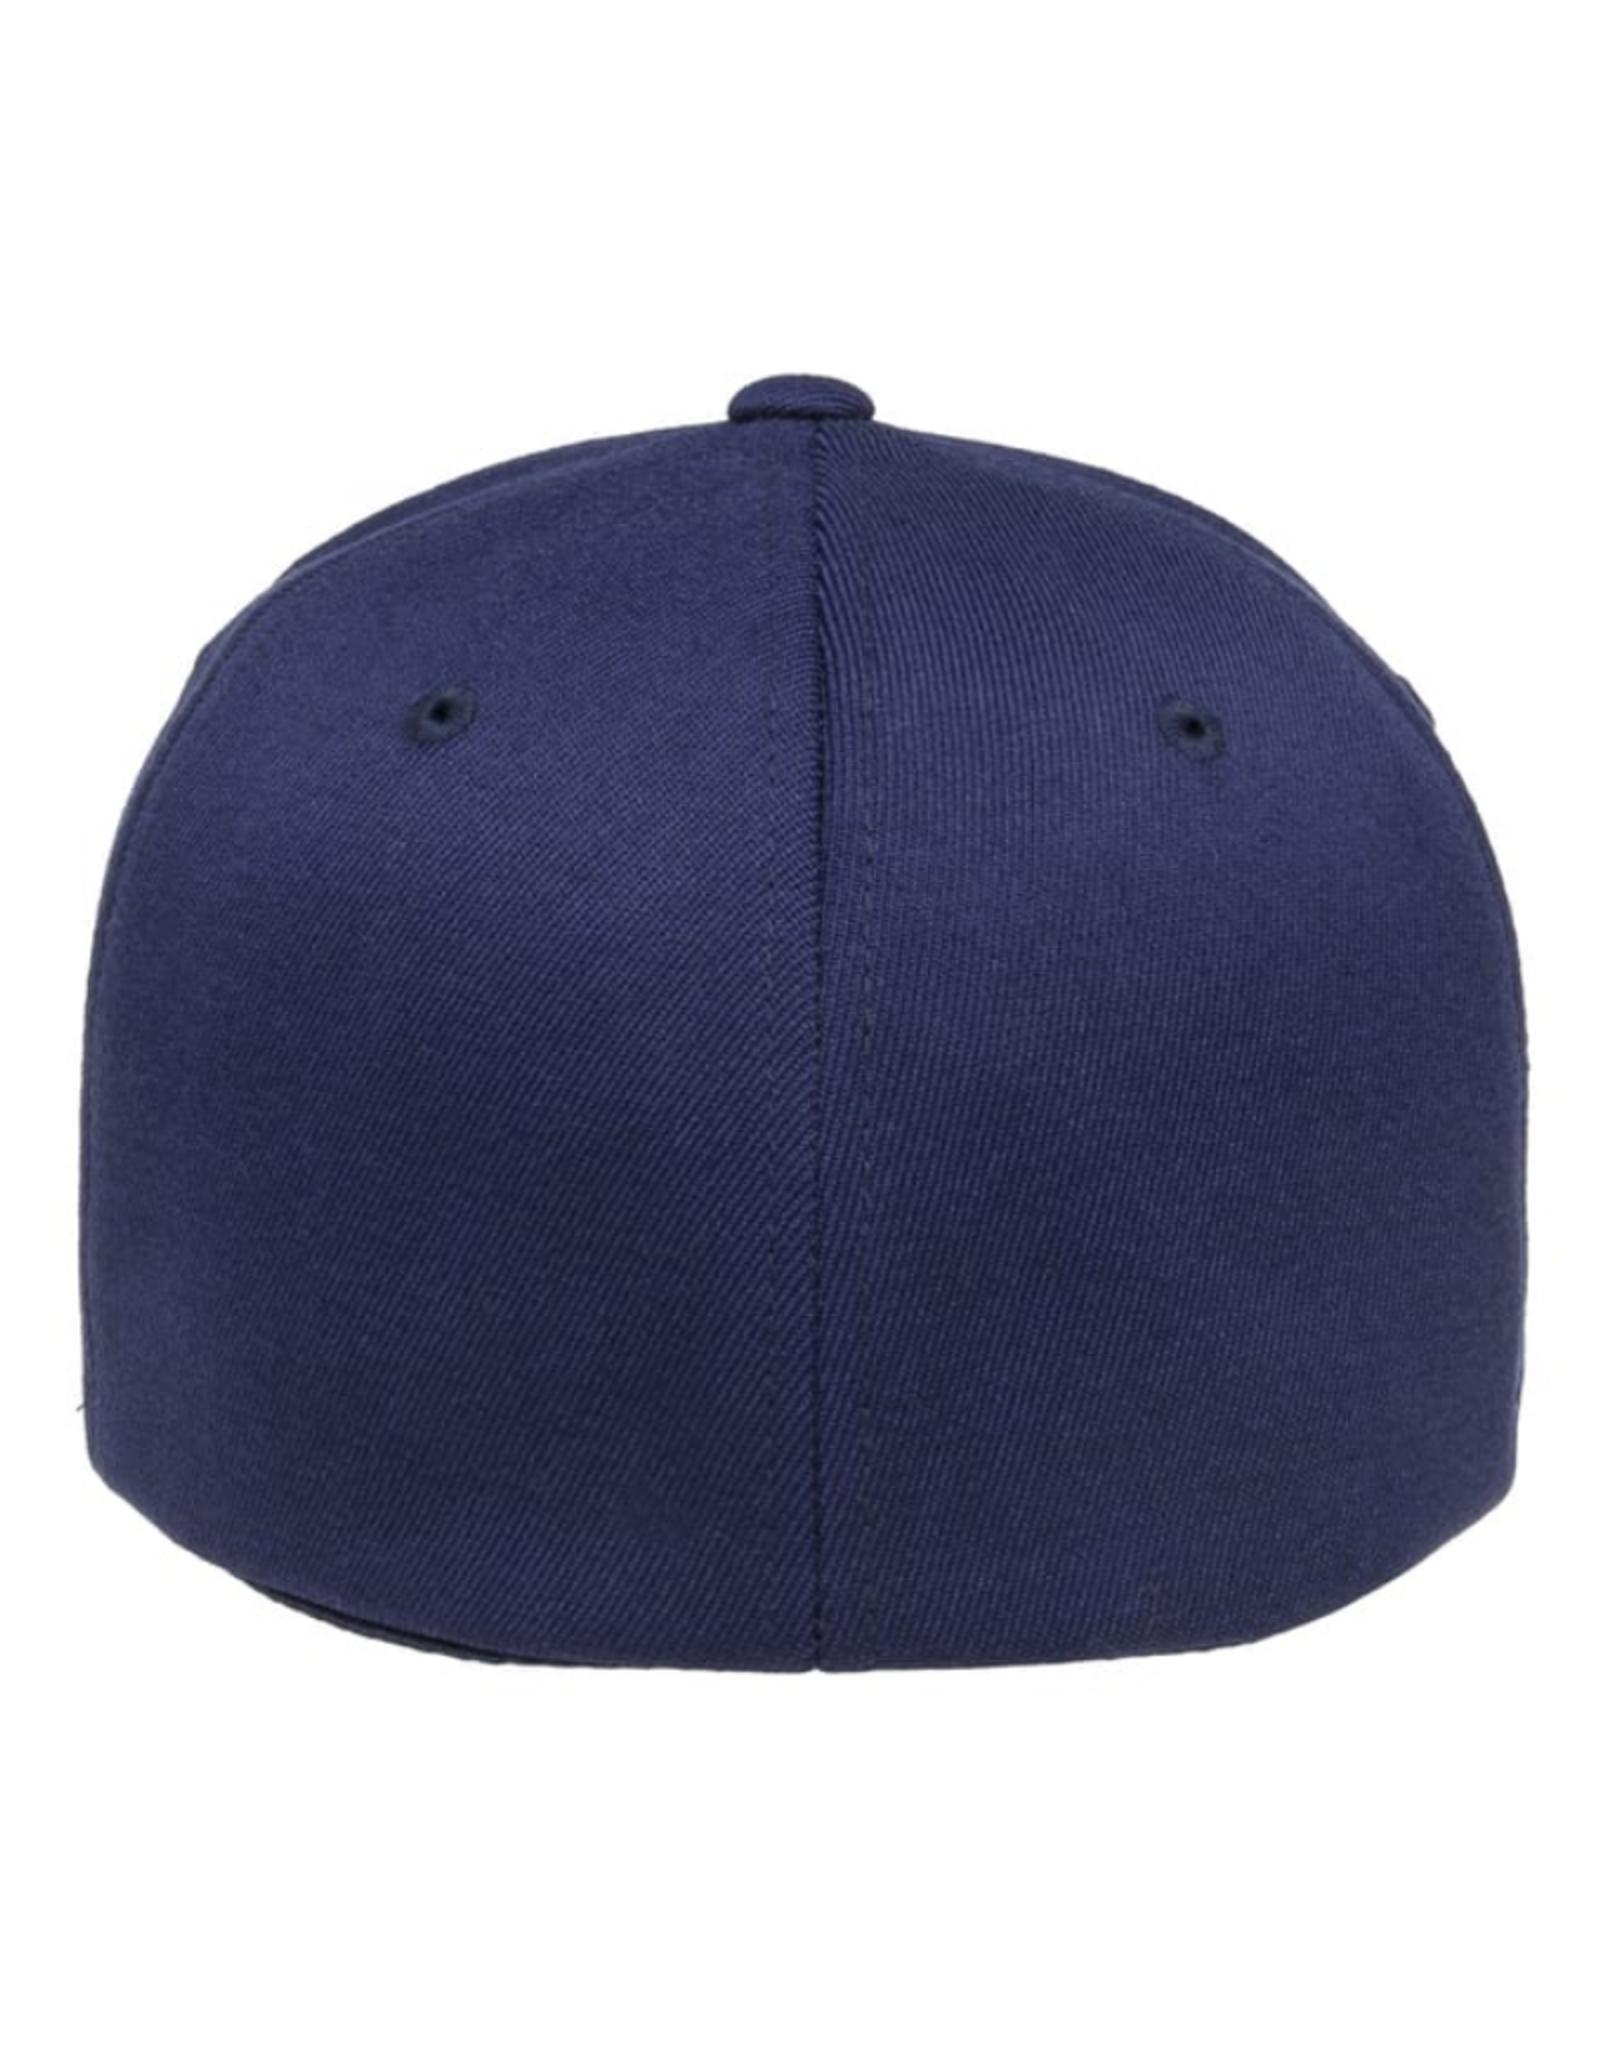 ATC Men's Wooly Combed Blank Flexfit Hat Navy